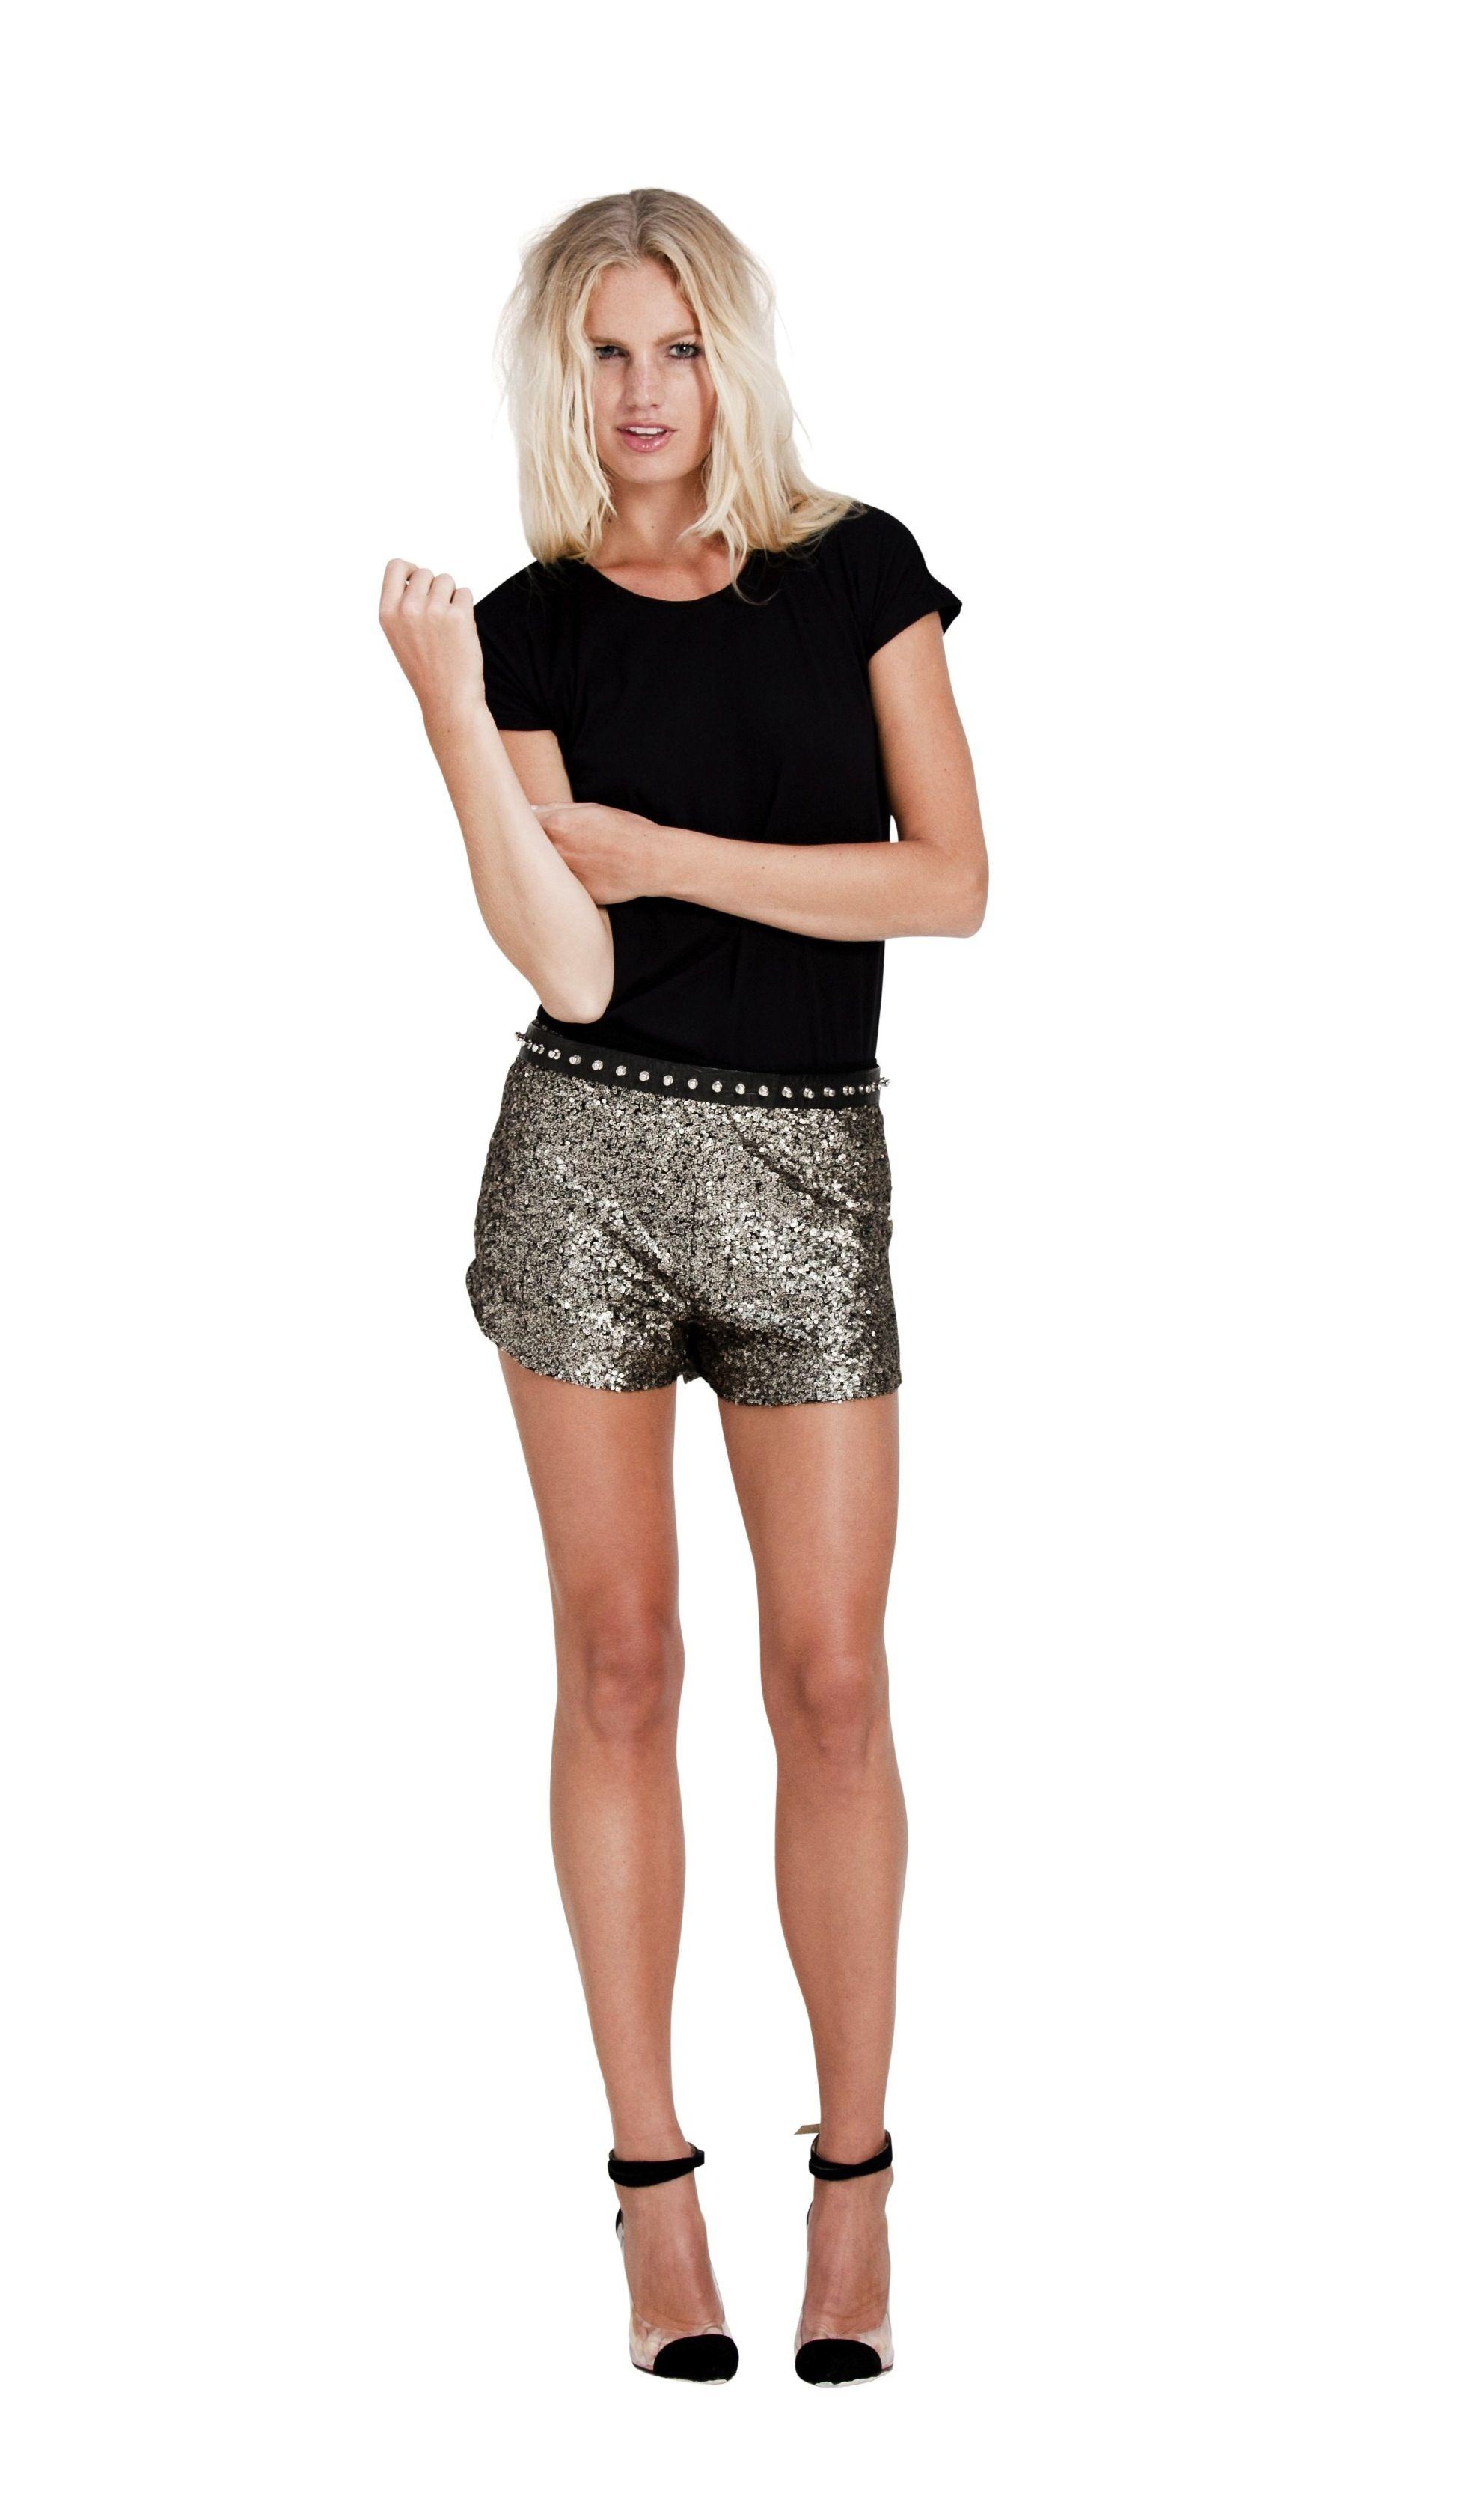 GOLD FINGER SEQUIN SHORTS - $69.50 : Jade Emily, Fashion E-Store